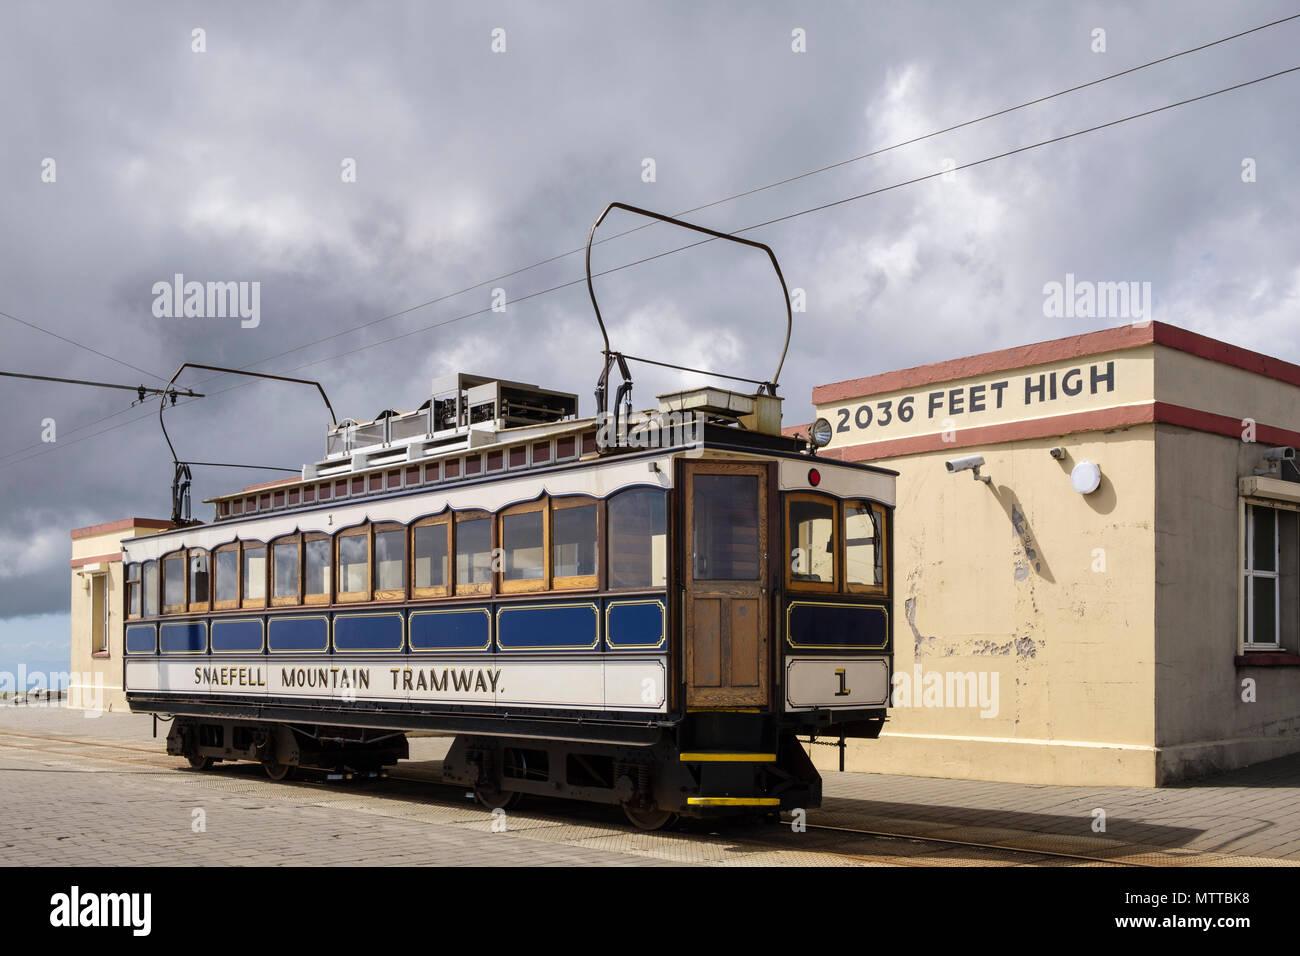 Montaña Snaefell Transporte Tren automotor eléctrico Tranvía número 1, construido en 1895, esperando en la estación cumbre cafe. Laxey, Isla de Man, Islas Británicas Imagen De Stock